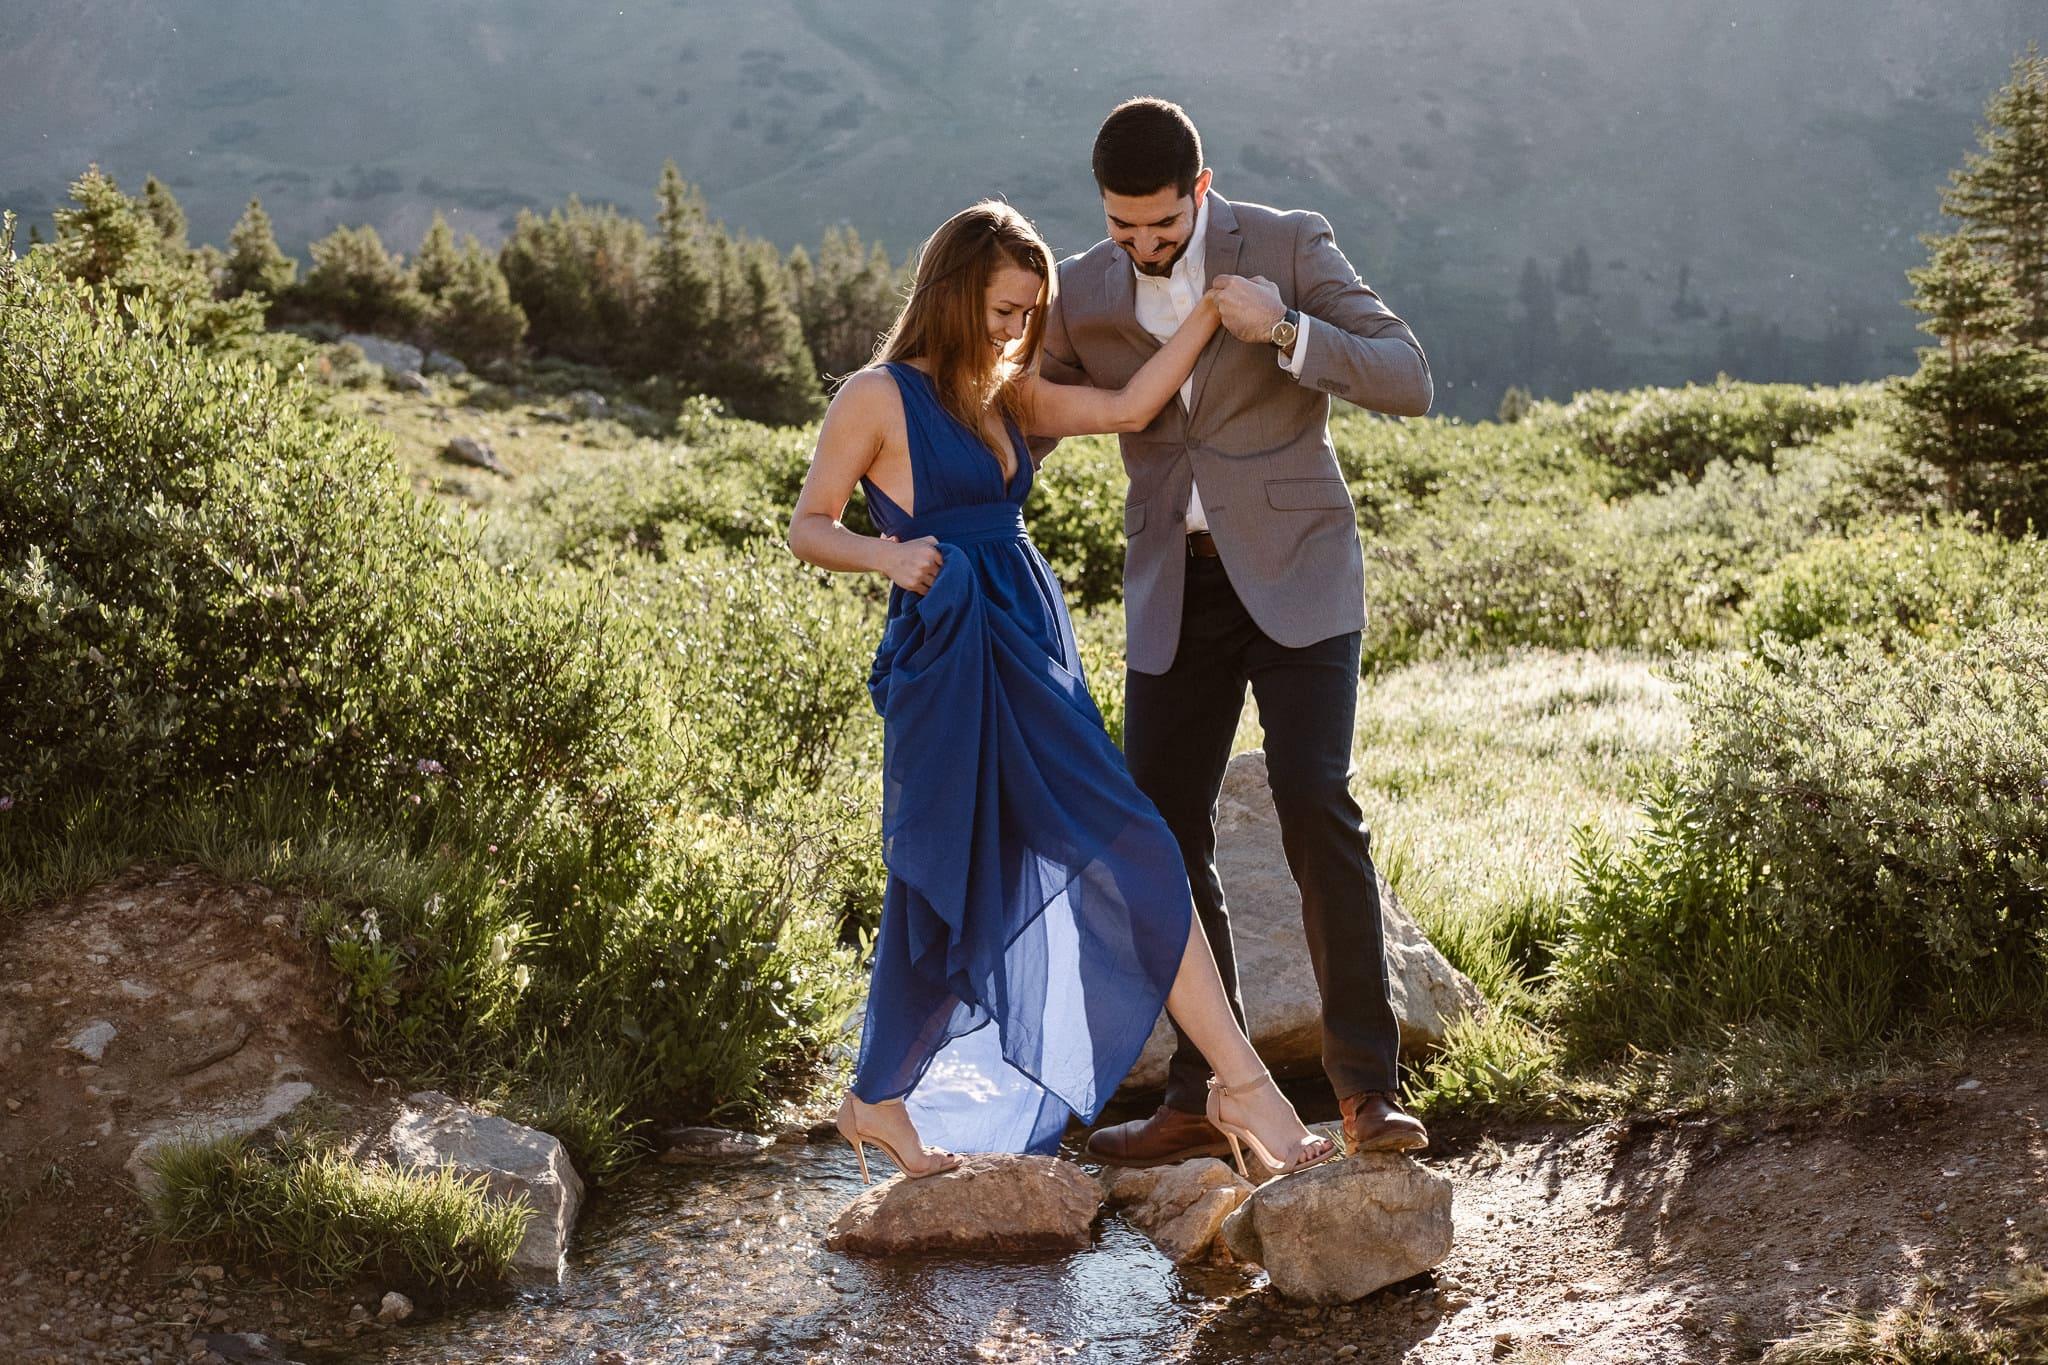 Colorado adventure engagement photography, Loveland Pass mountain elopement, Summit County wedding photographer